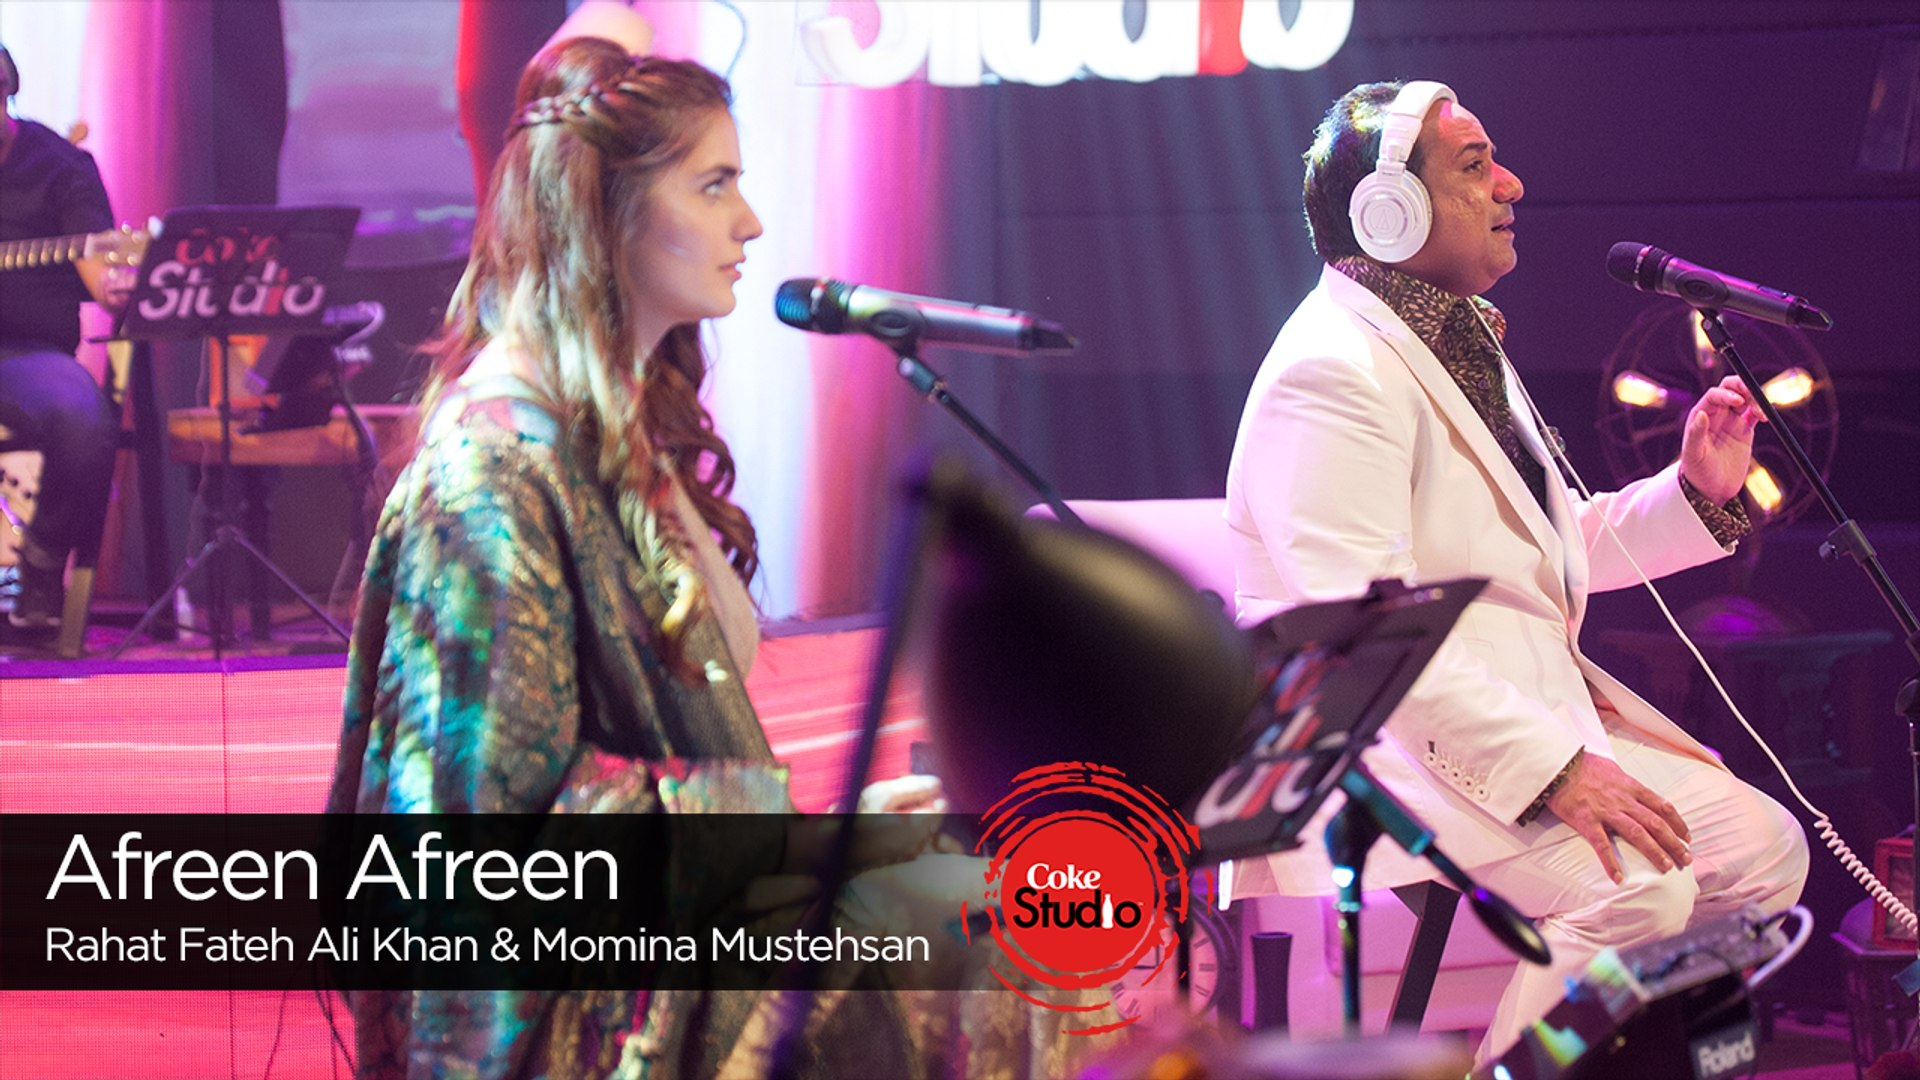 Afreen Afreen Rahat Fateh Ali Khan Momina Mustehsan Episode 2 Coke Studio 9